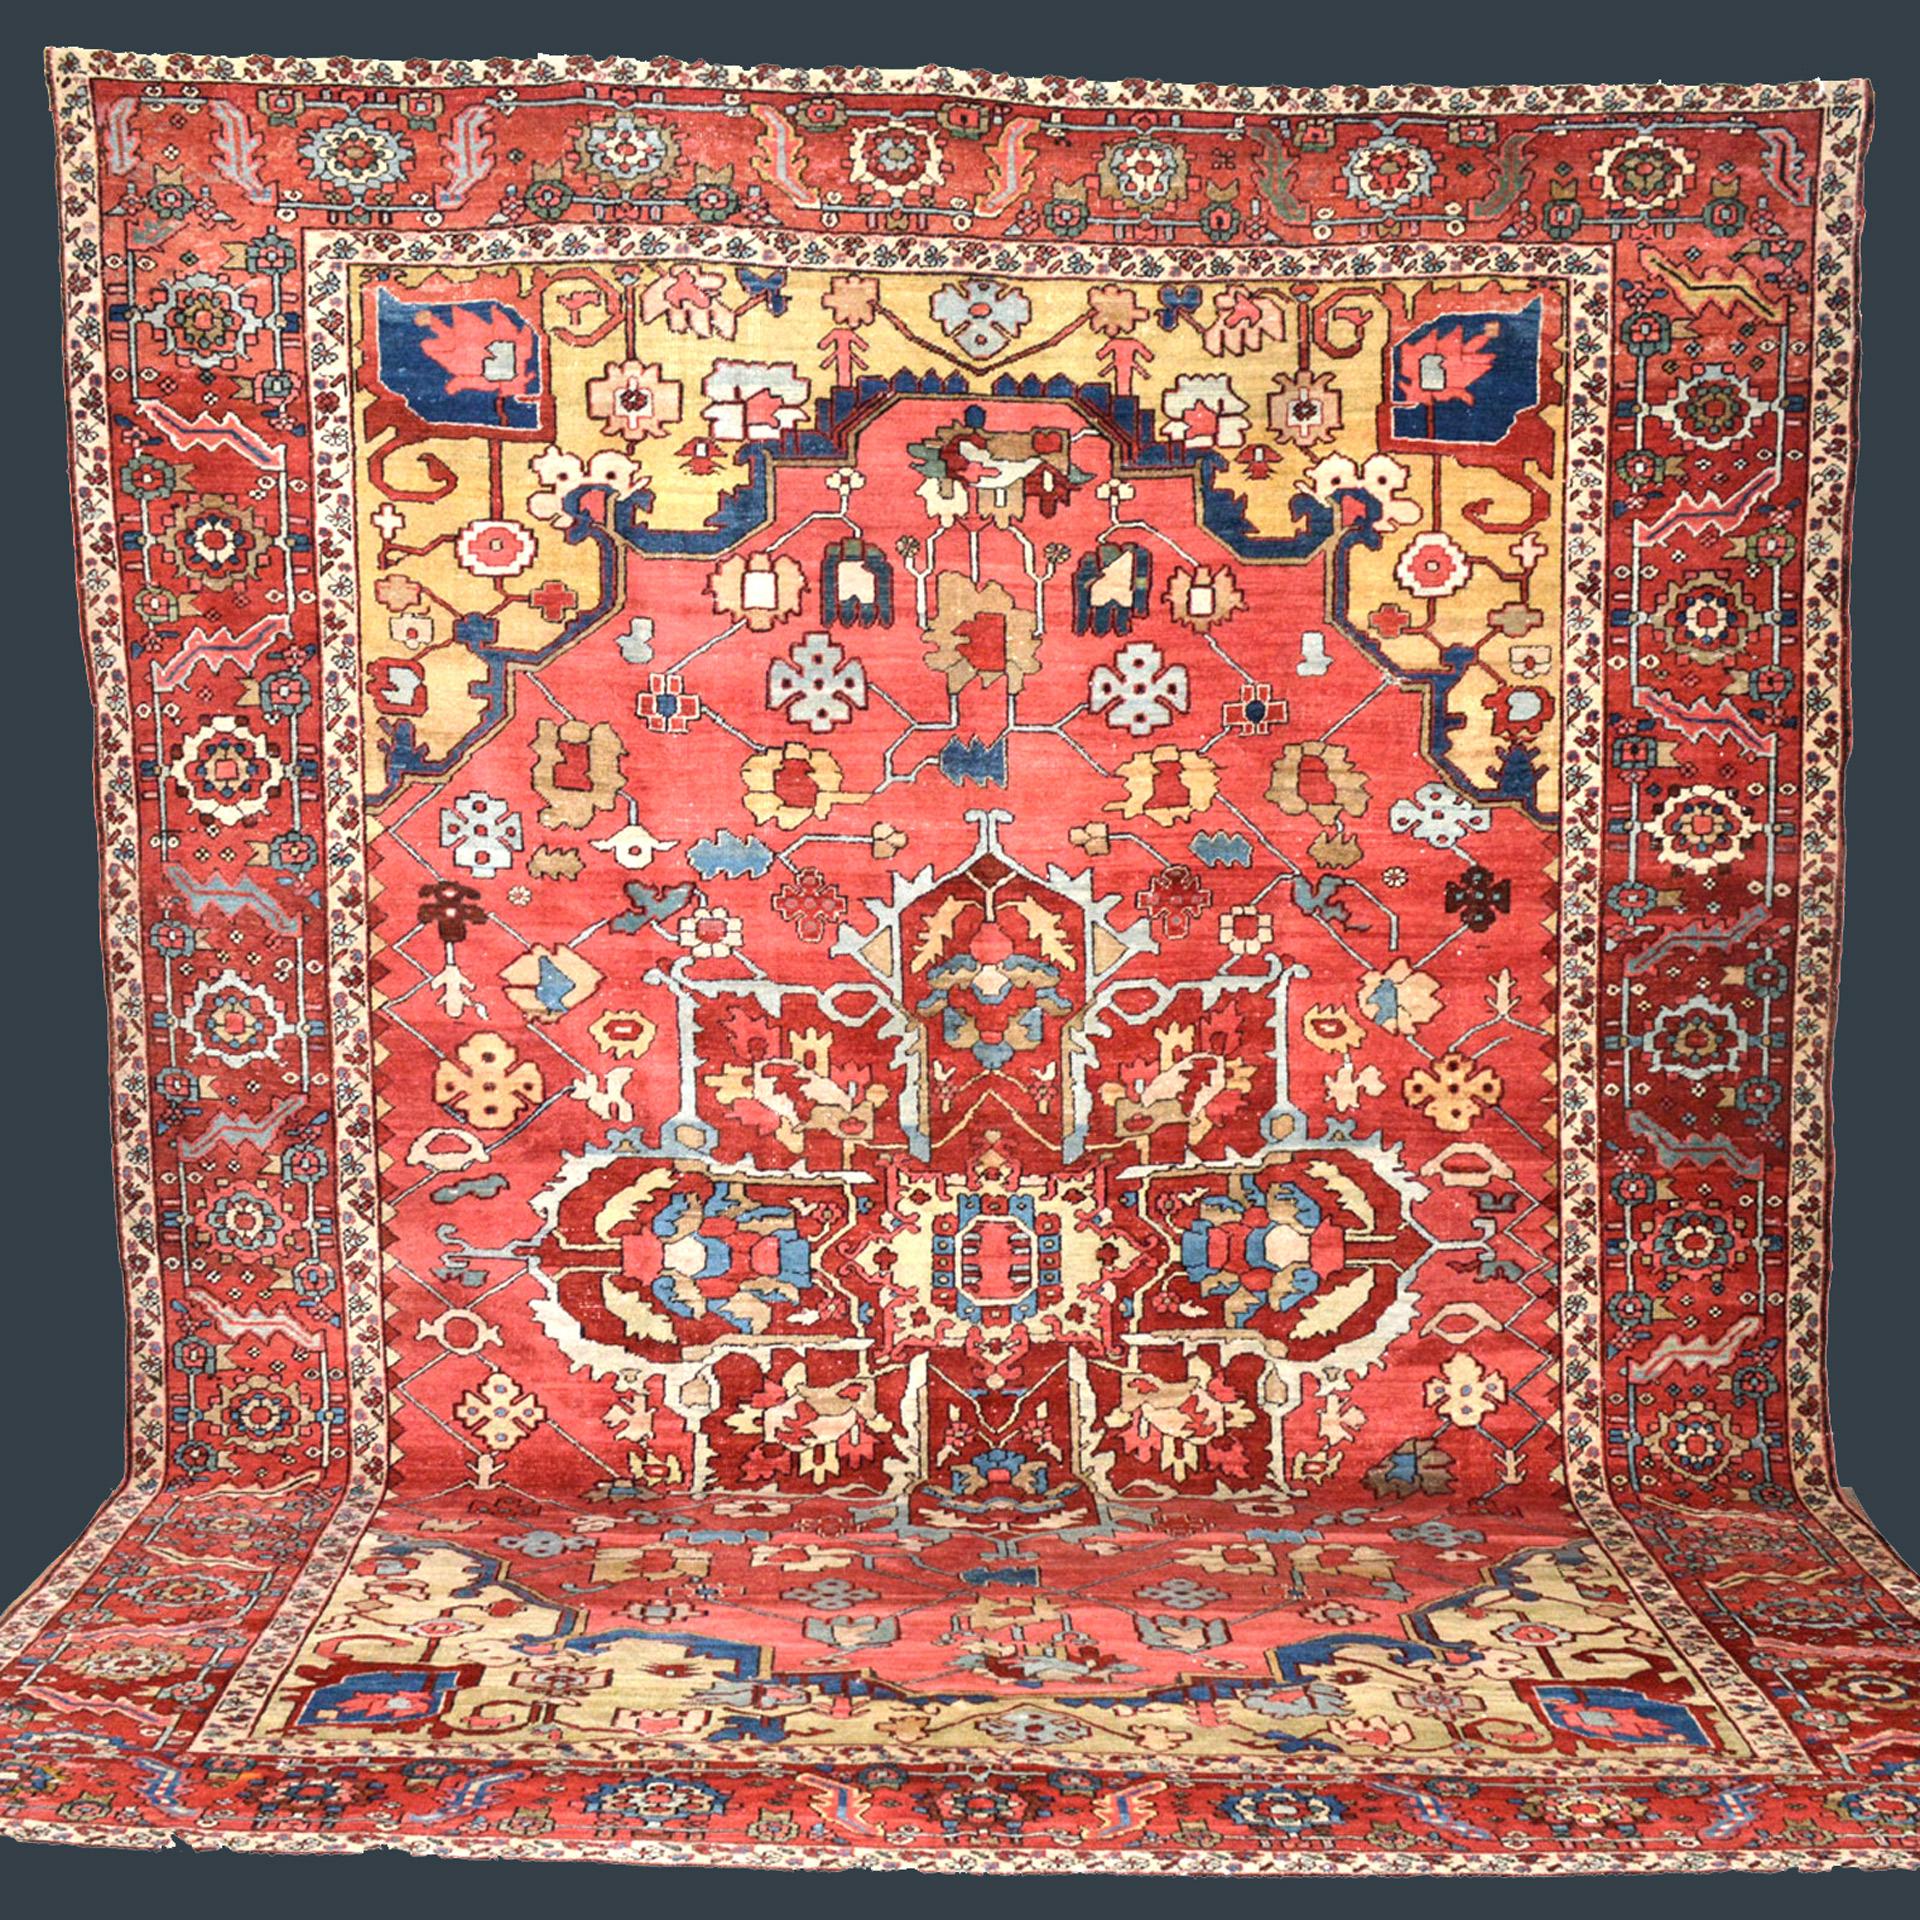 Antique Heriz Serapi carpet with coral color field